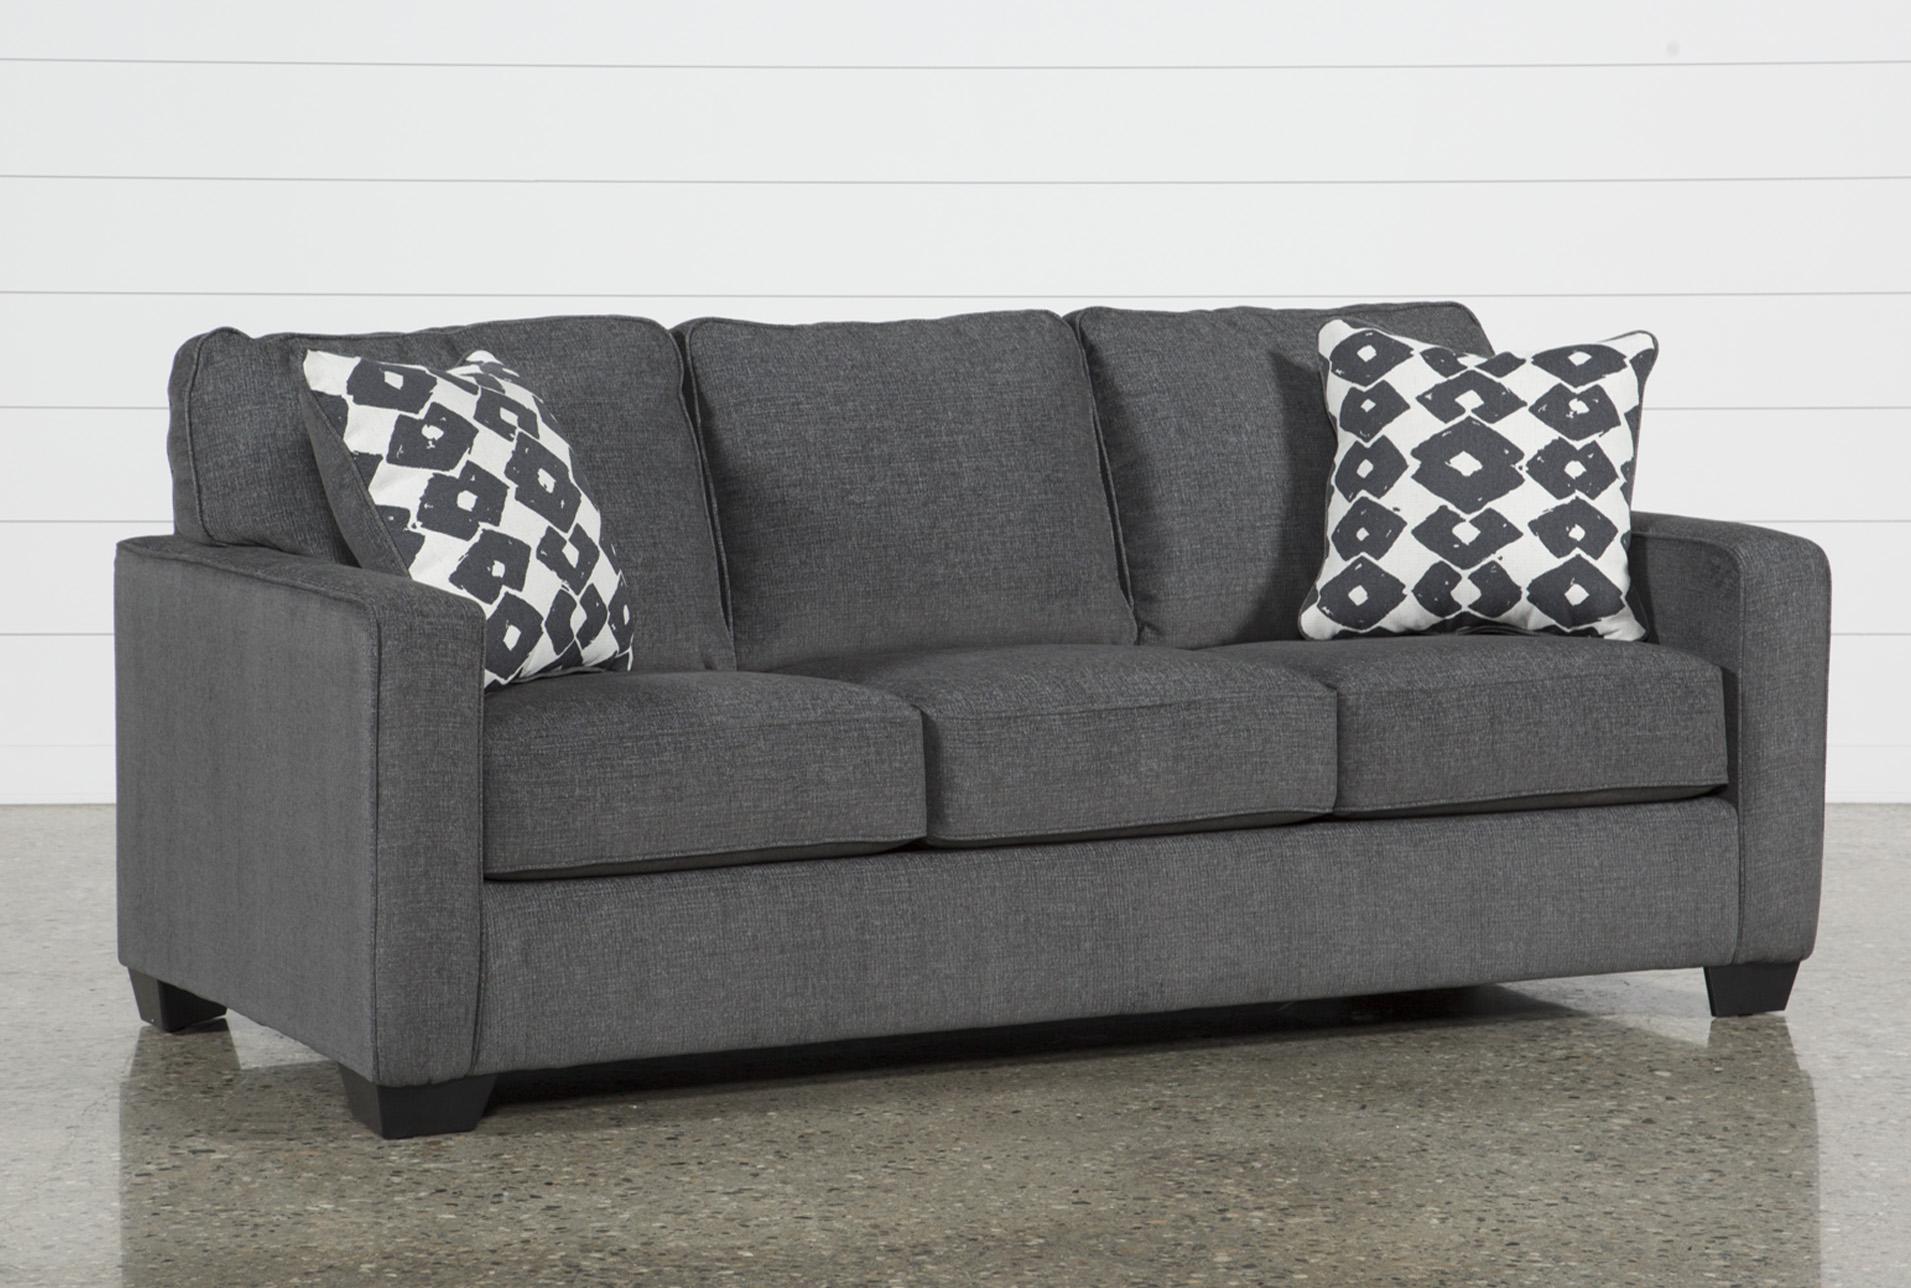 turdur queen sofa sleeper living spaces rh livingspaces com living spaces furniture sofa beds living spaces sofa bed sectional